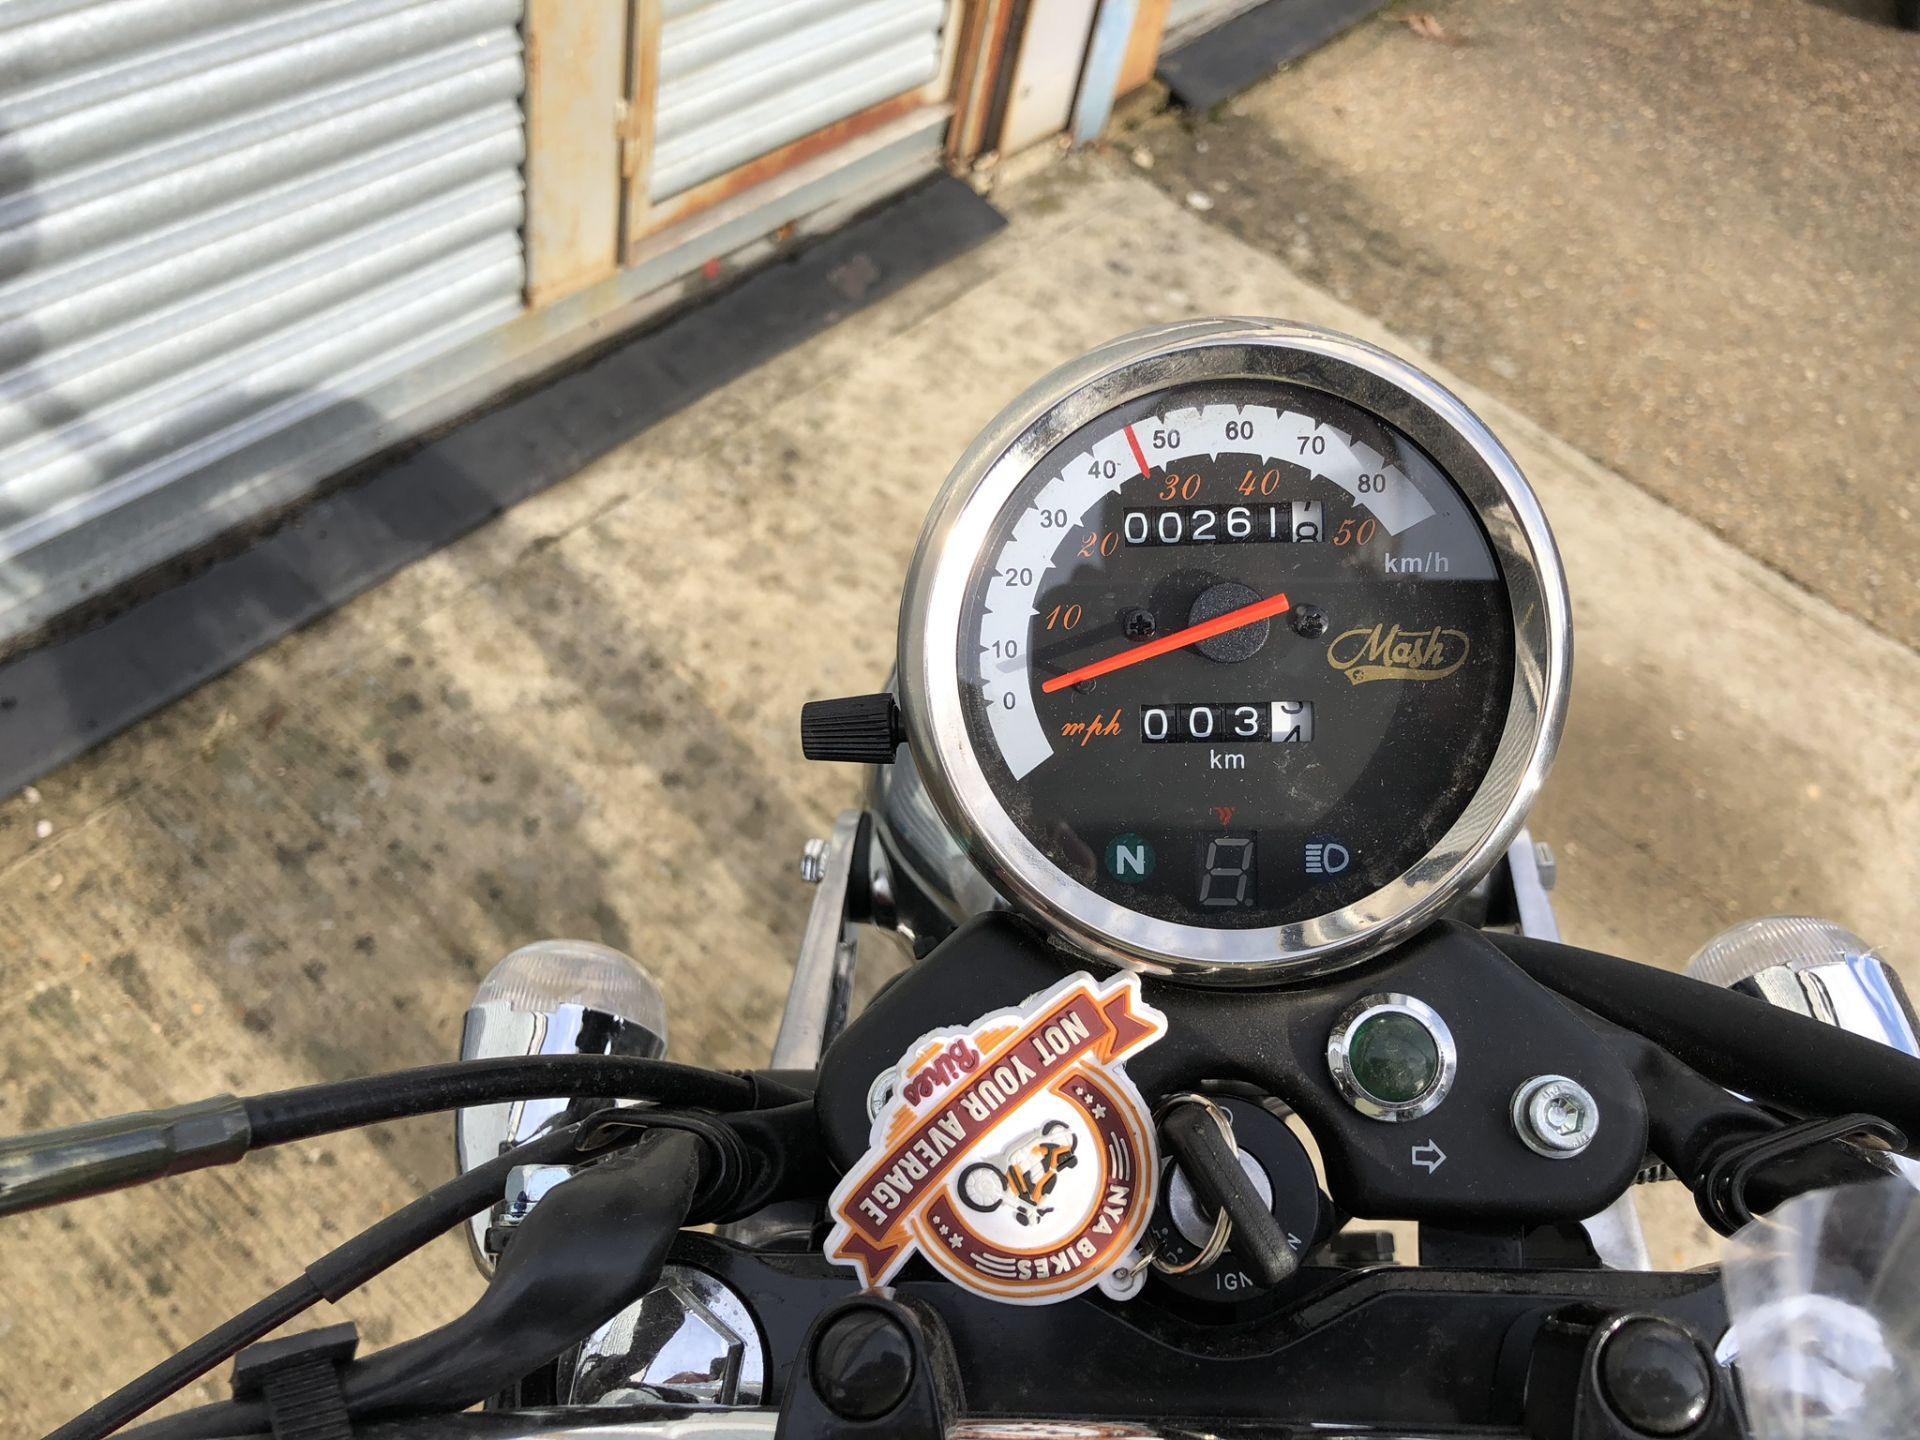 Lot 9 - Mash 50 Roadstar